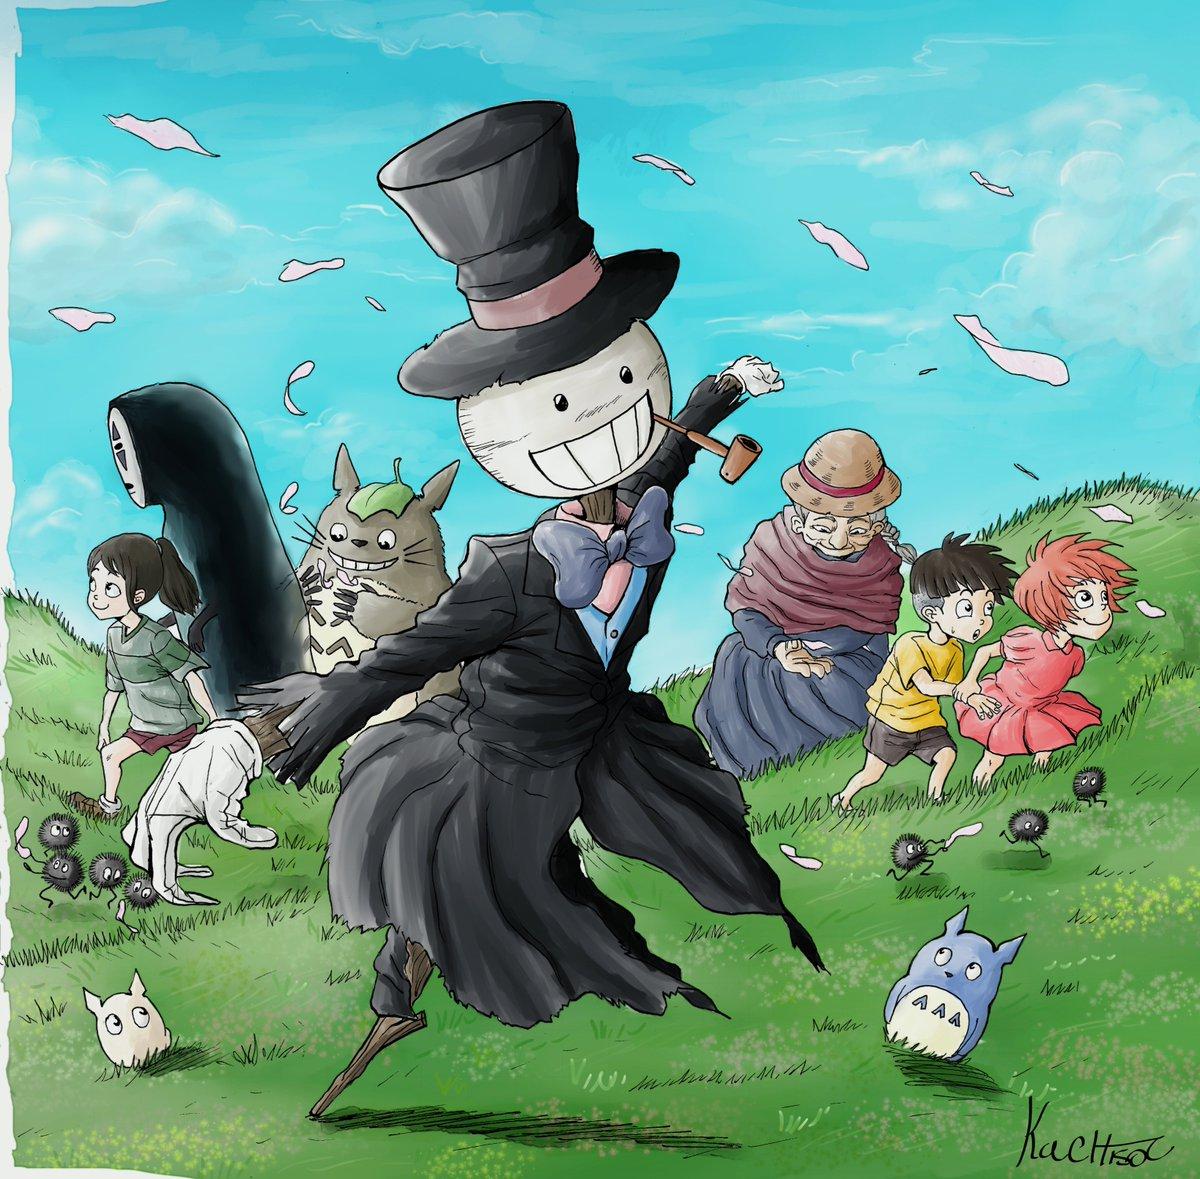 I&#39;m a big fan of Hayao Miyazaki, so it was a honor to draw his characters. I hope you guys liked it!  #fanart #studioghibli #となりのトトロ #千と千尋の神隠し #崖の上のポニョ #ハウルの動く城 #rt #myart<br>http://pic.twitter.com/Cw2ecK6dtM